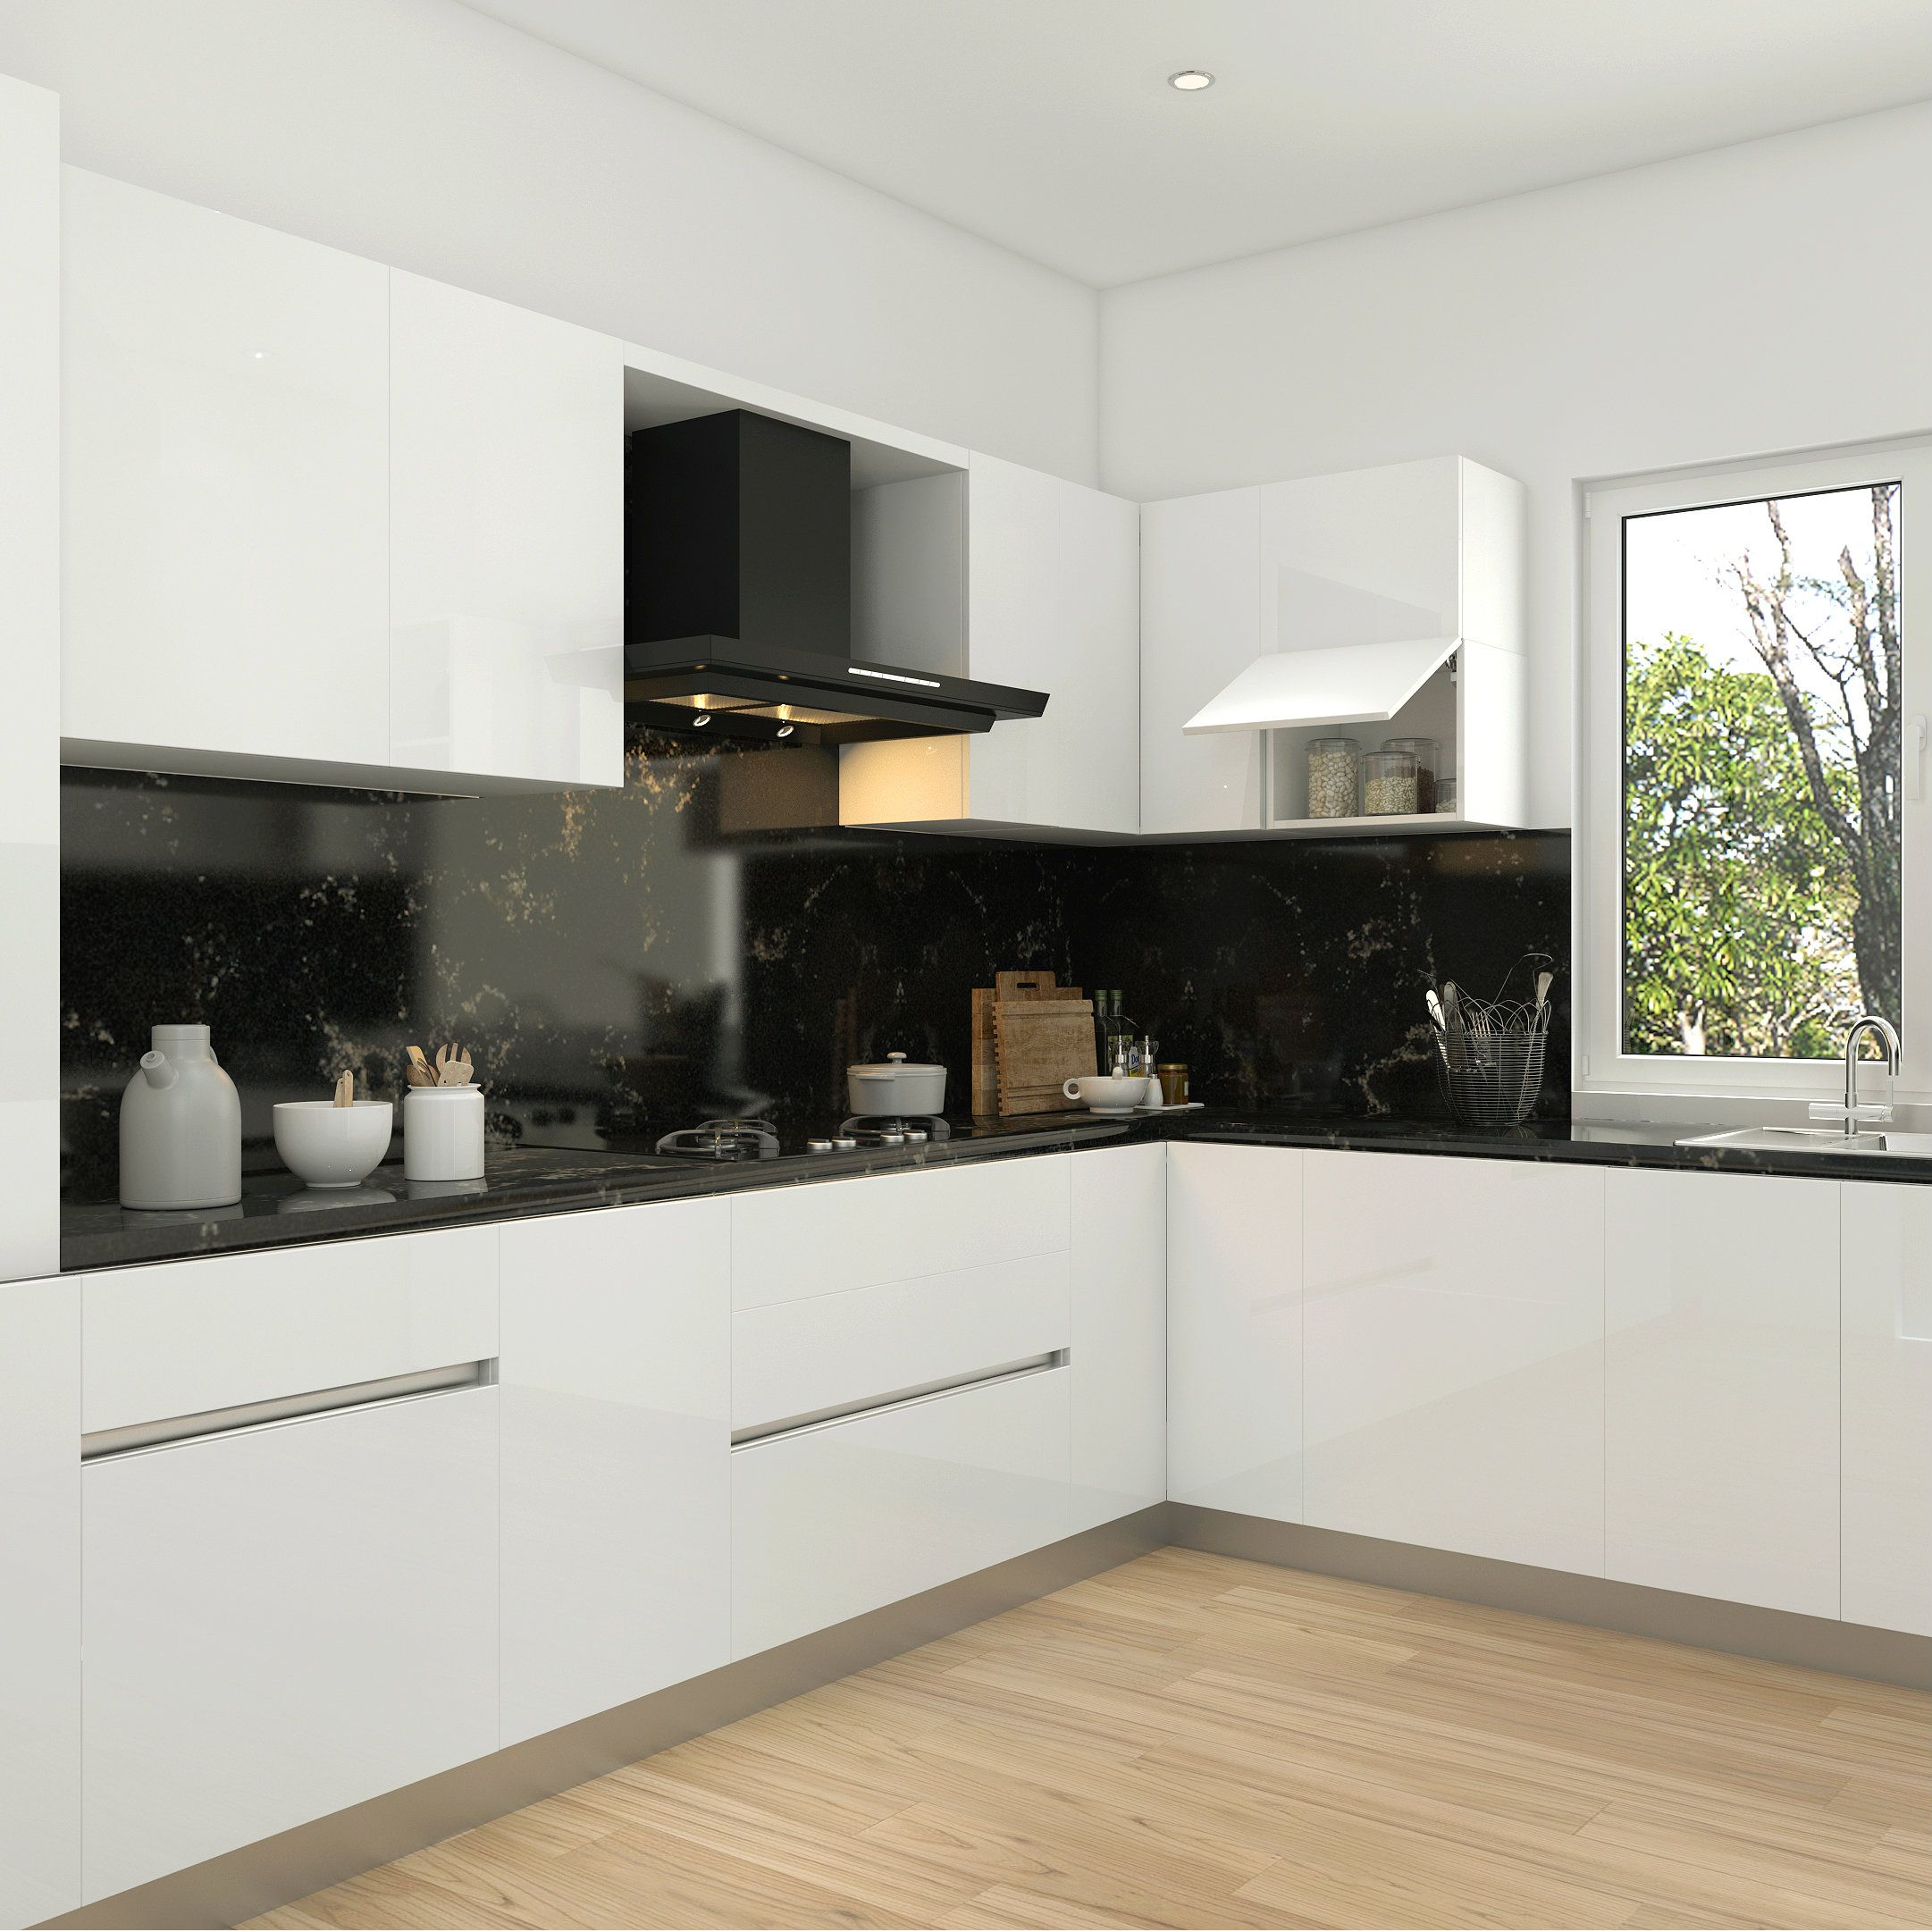 Gorgeous Black Backsplash In A Stylish Modular Kitchen Kitchen